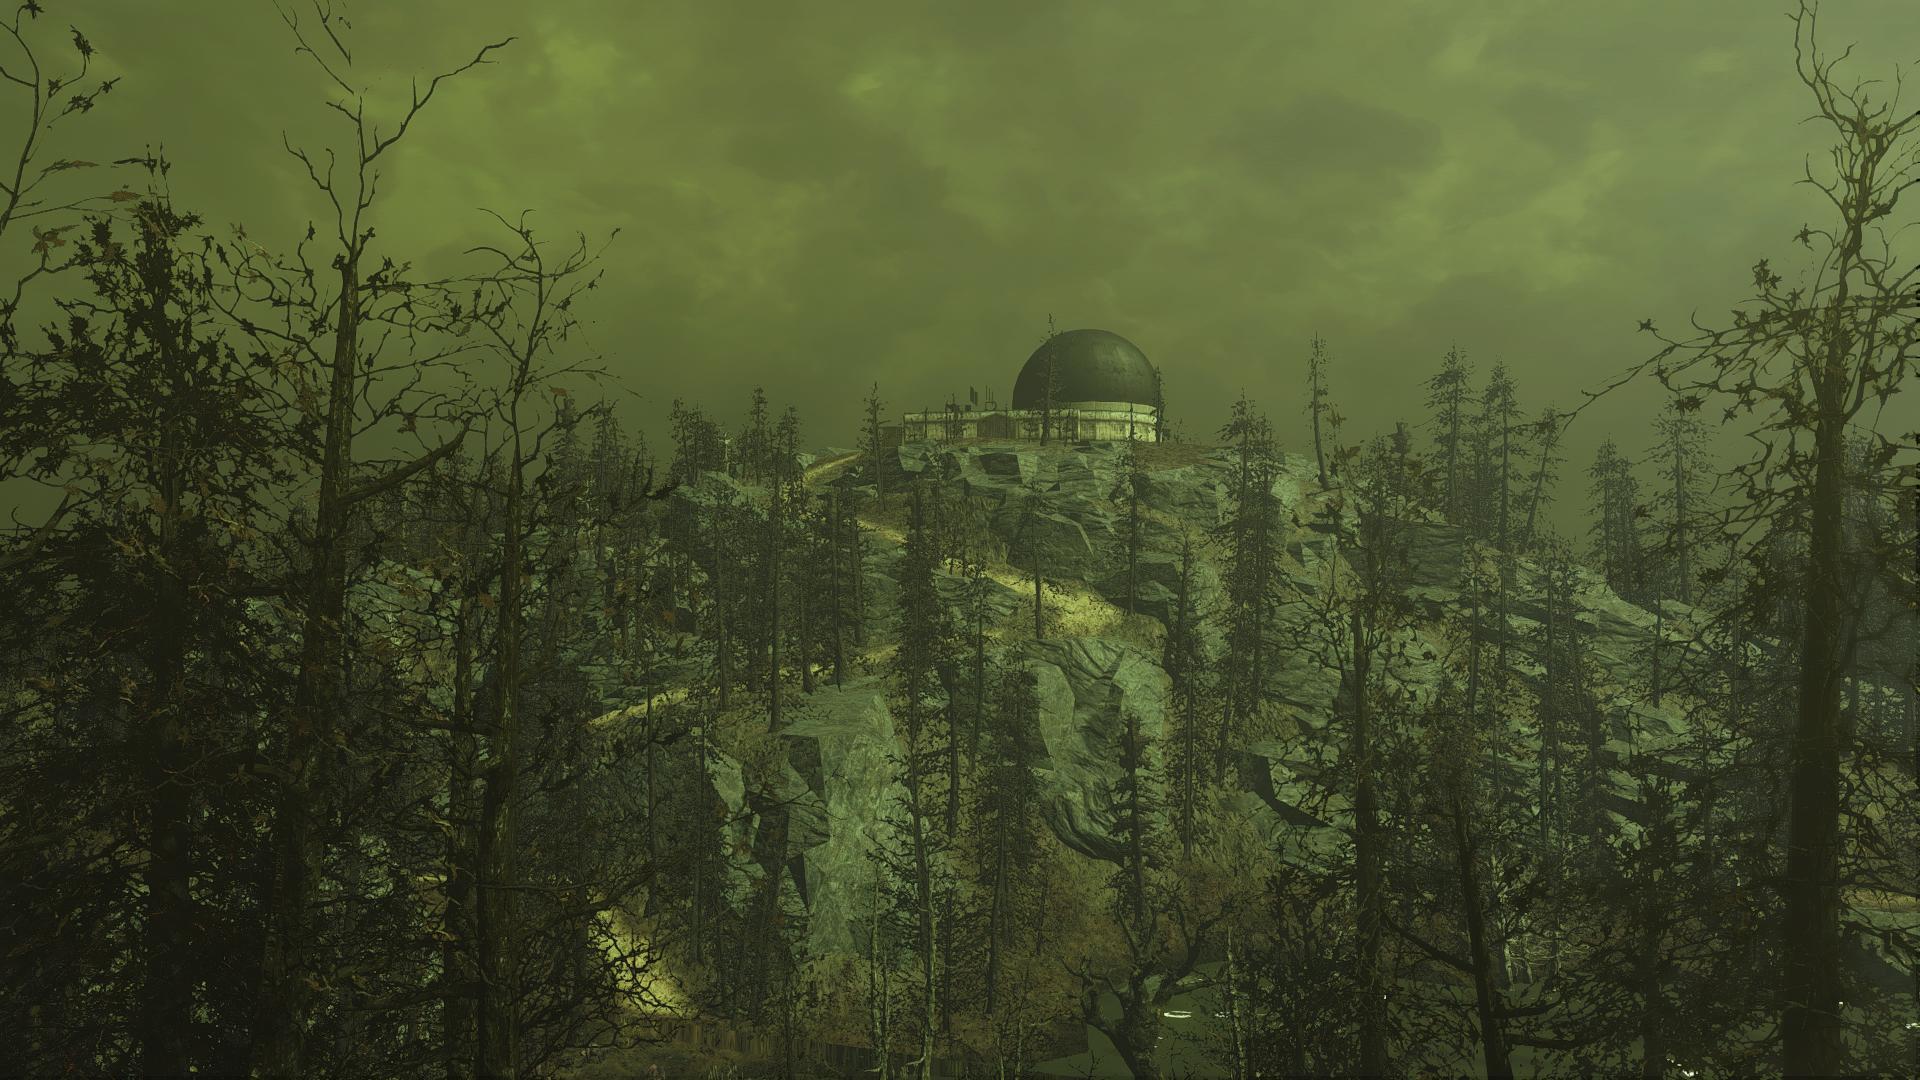 000566.Jpg - Fallout 4